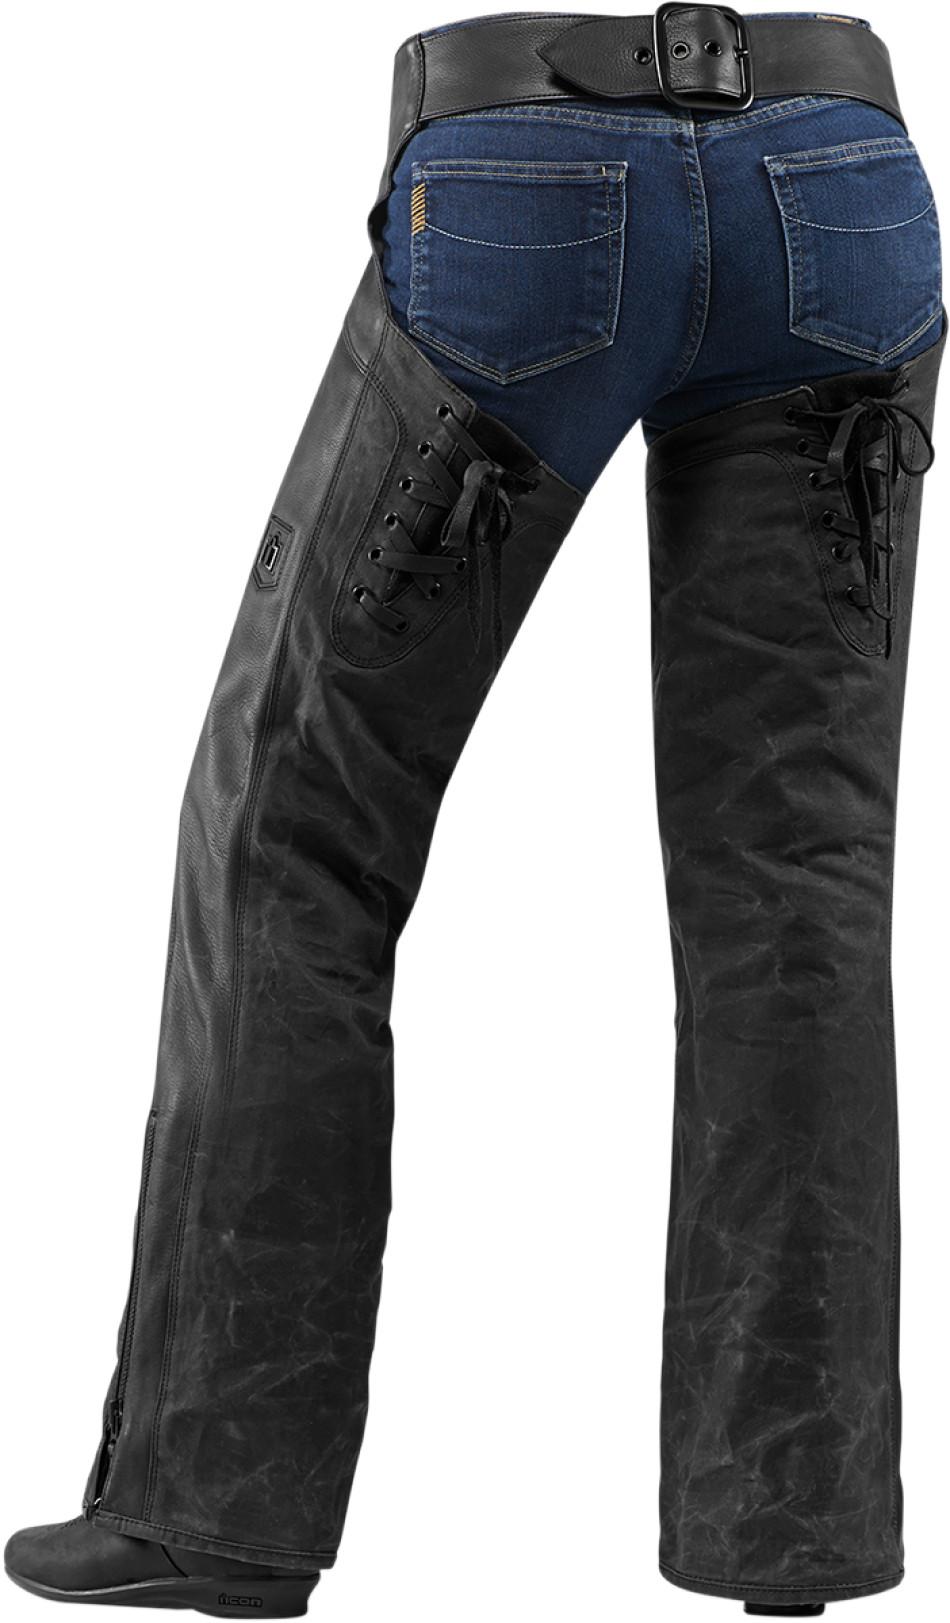 【ICON】CHAPS 褲 WM HELLA 1000 - 「Webike-摩托百貨」